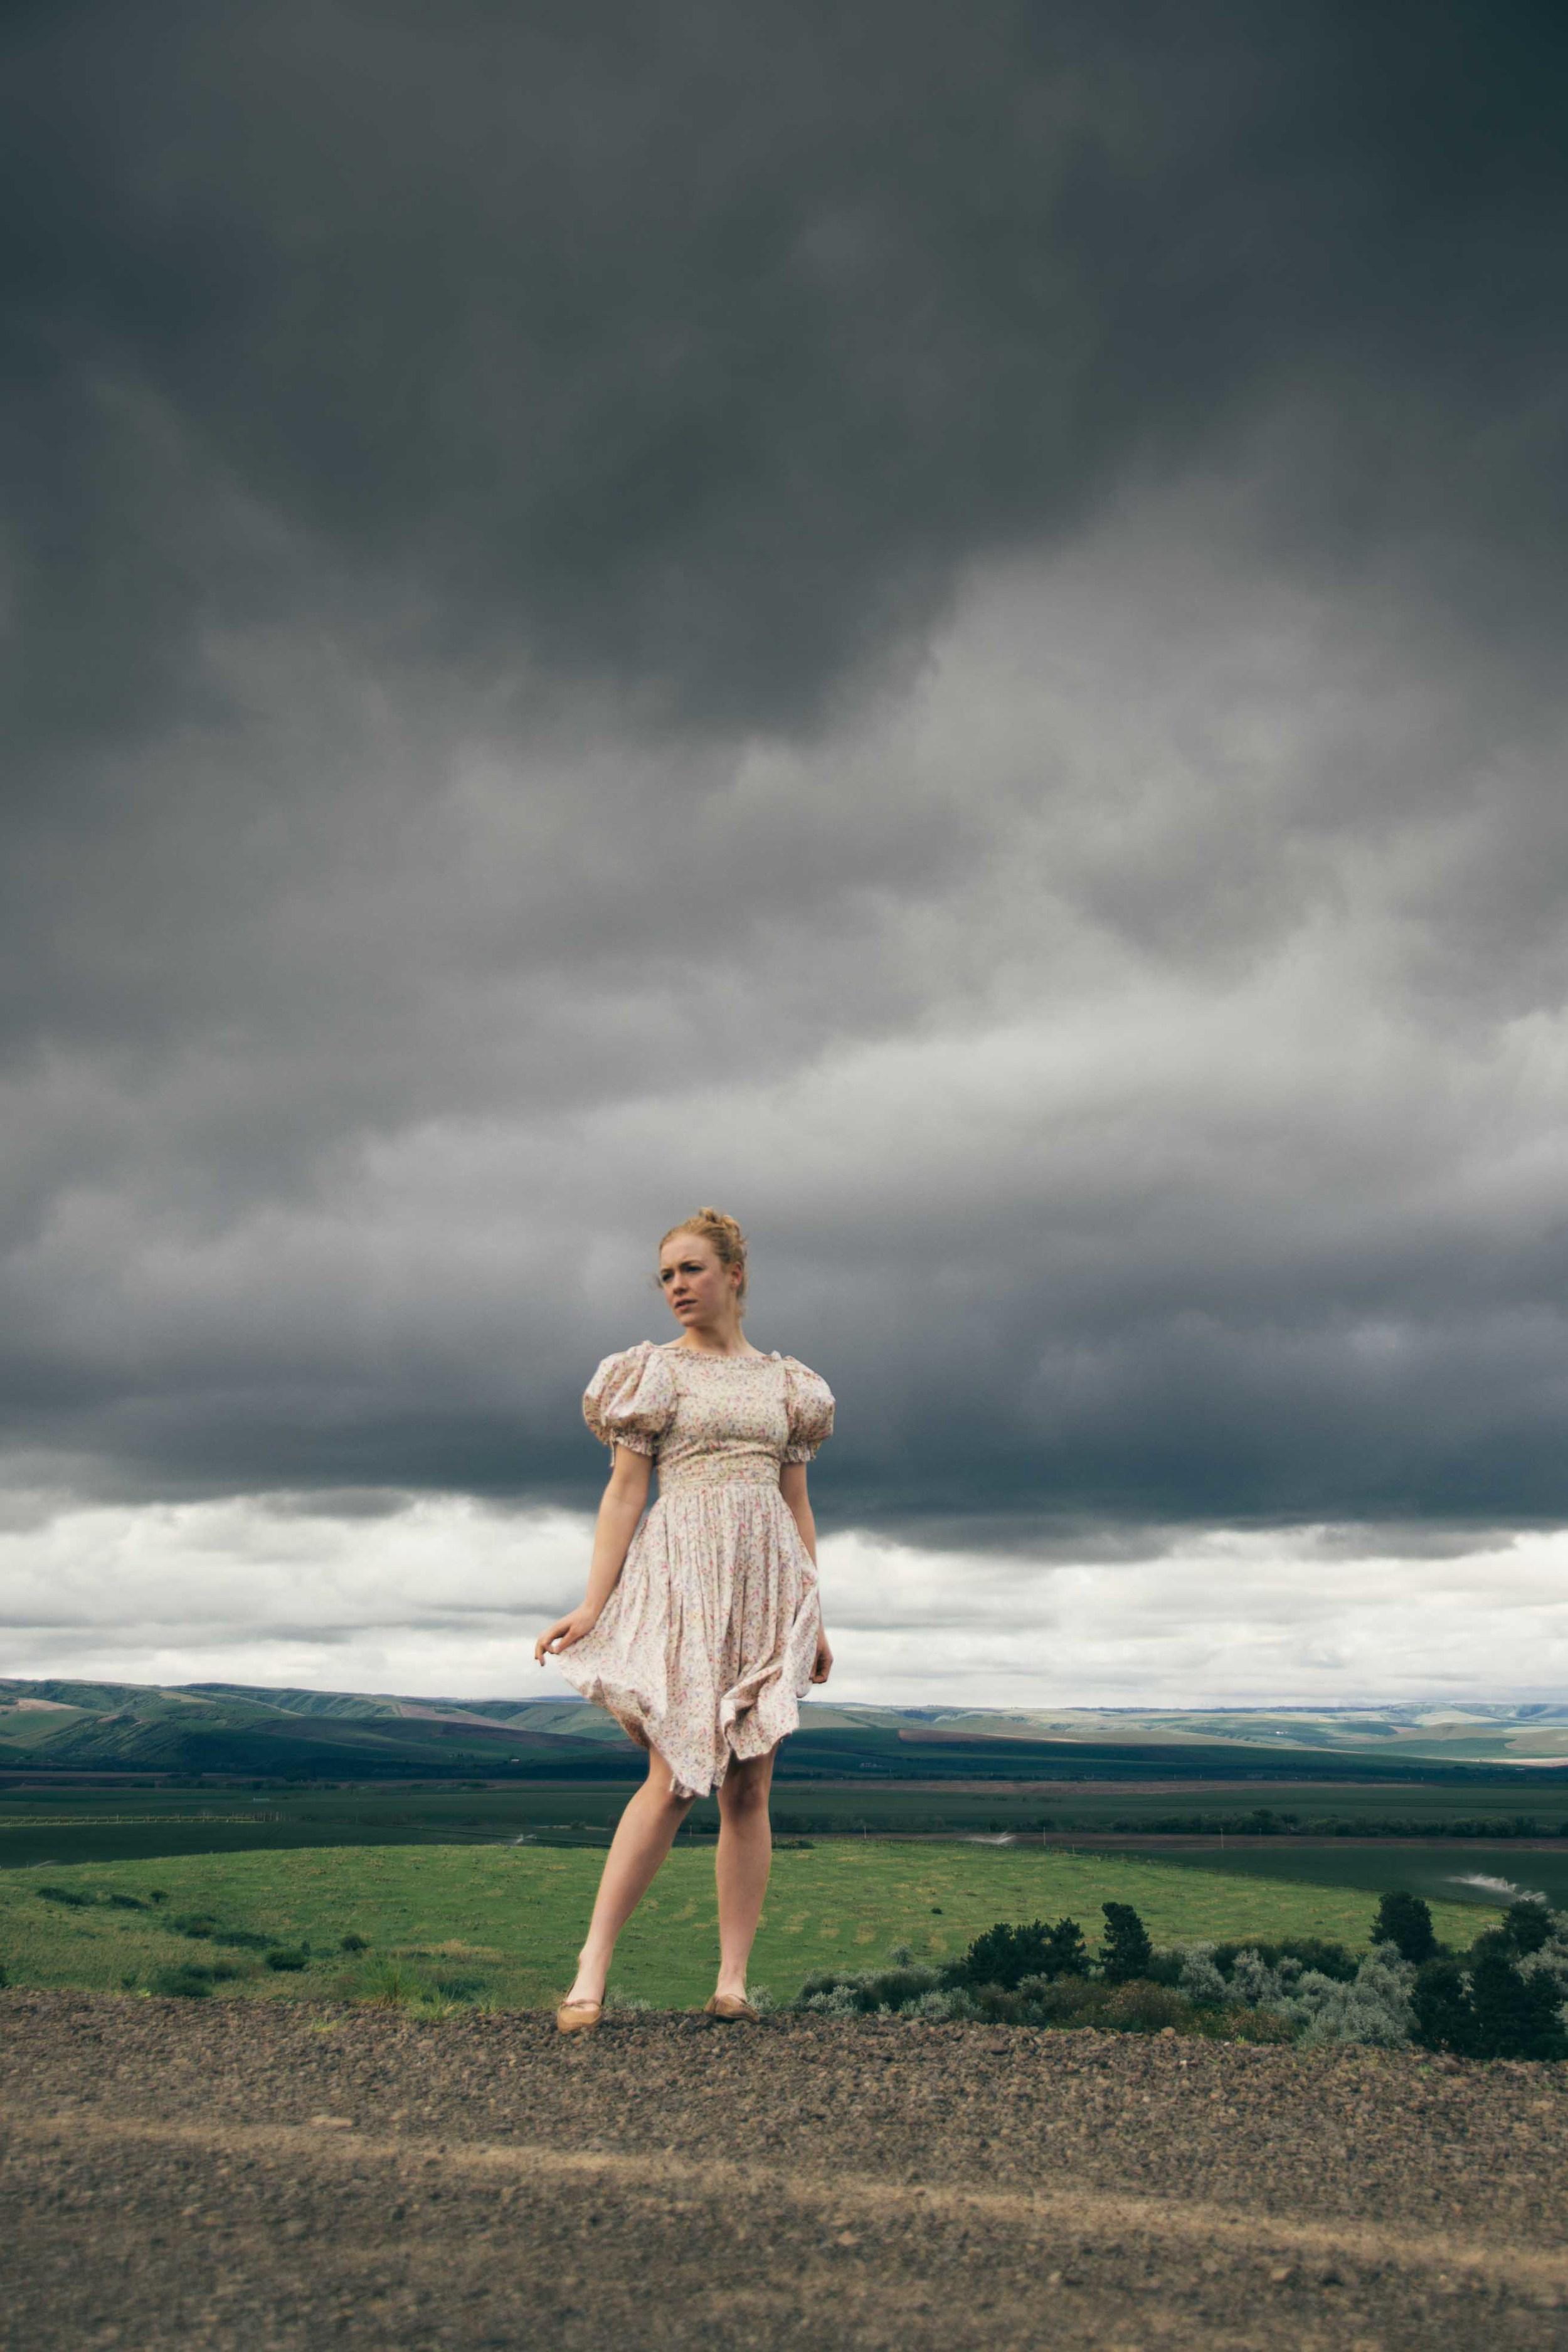 Los angeles lookbook photographer